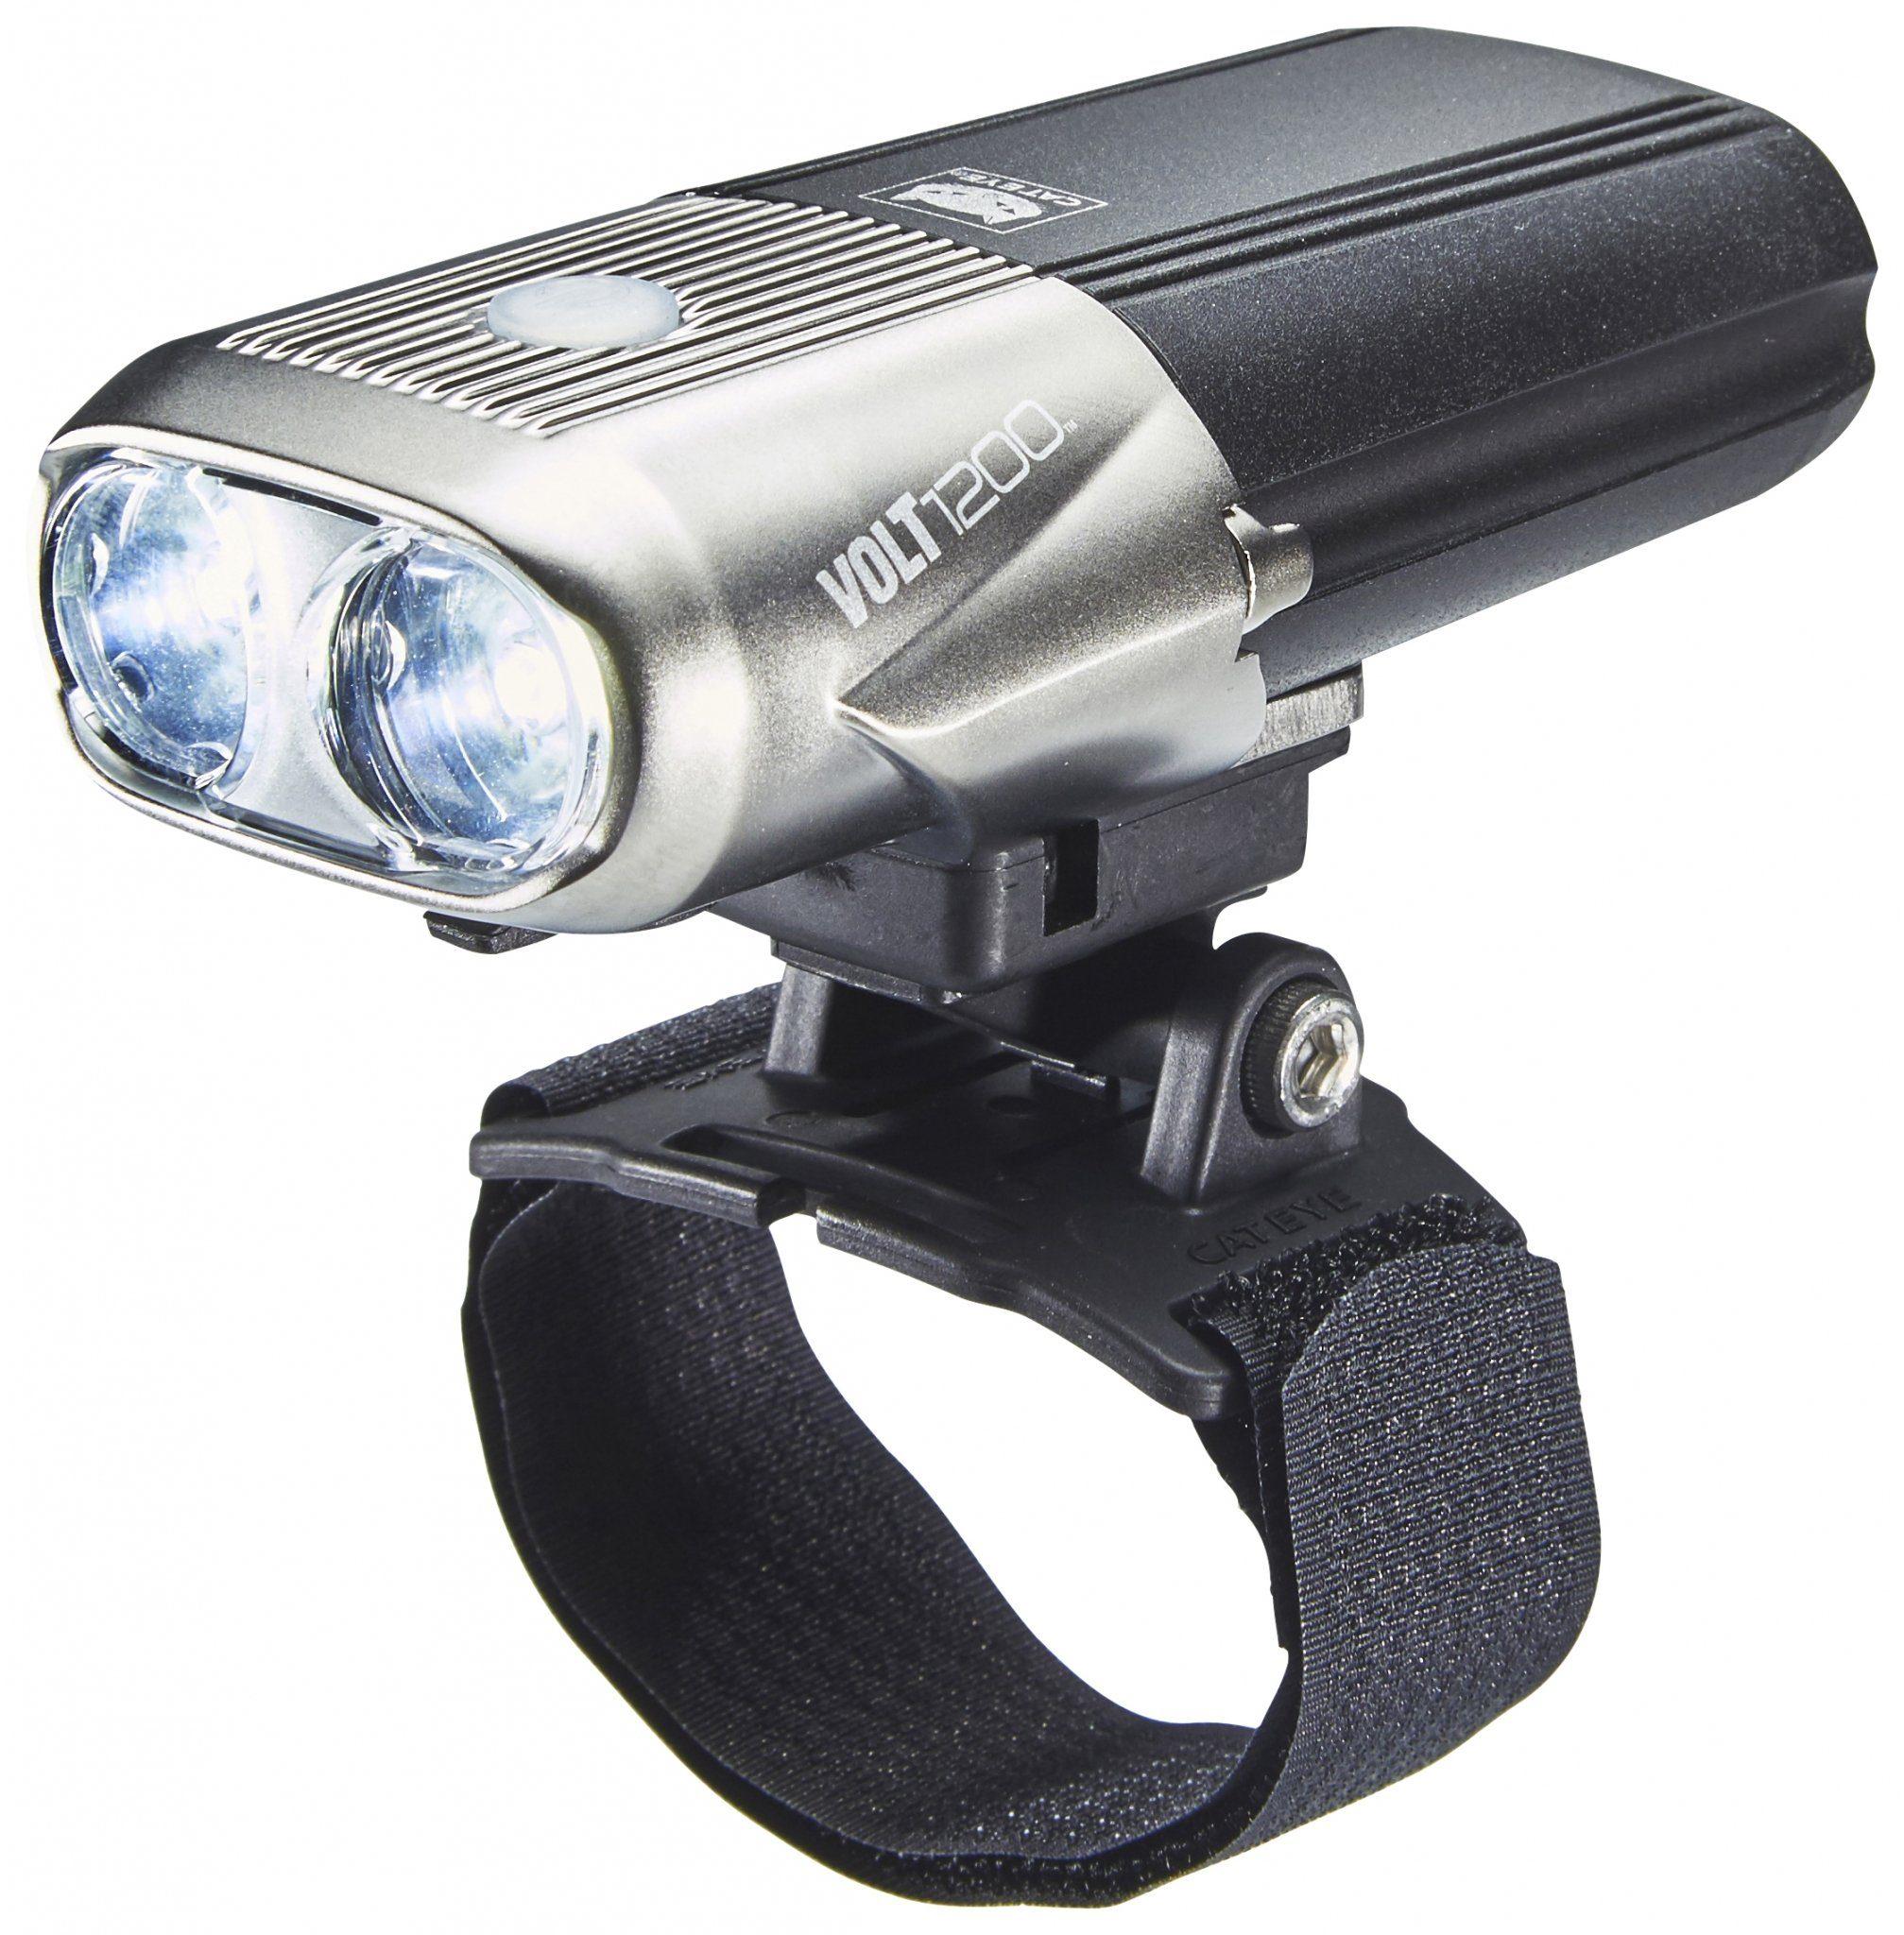 Cateye Fahrradbeleuchtung »Volt1200 HL-EL1000 RC Helmlampe«